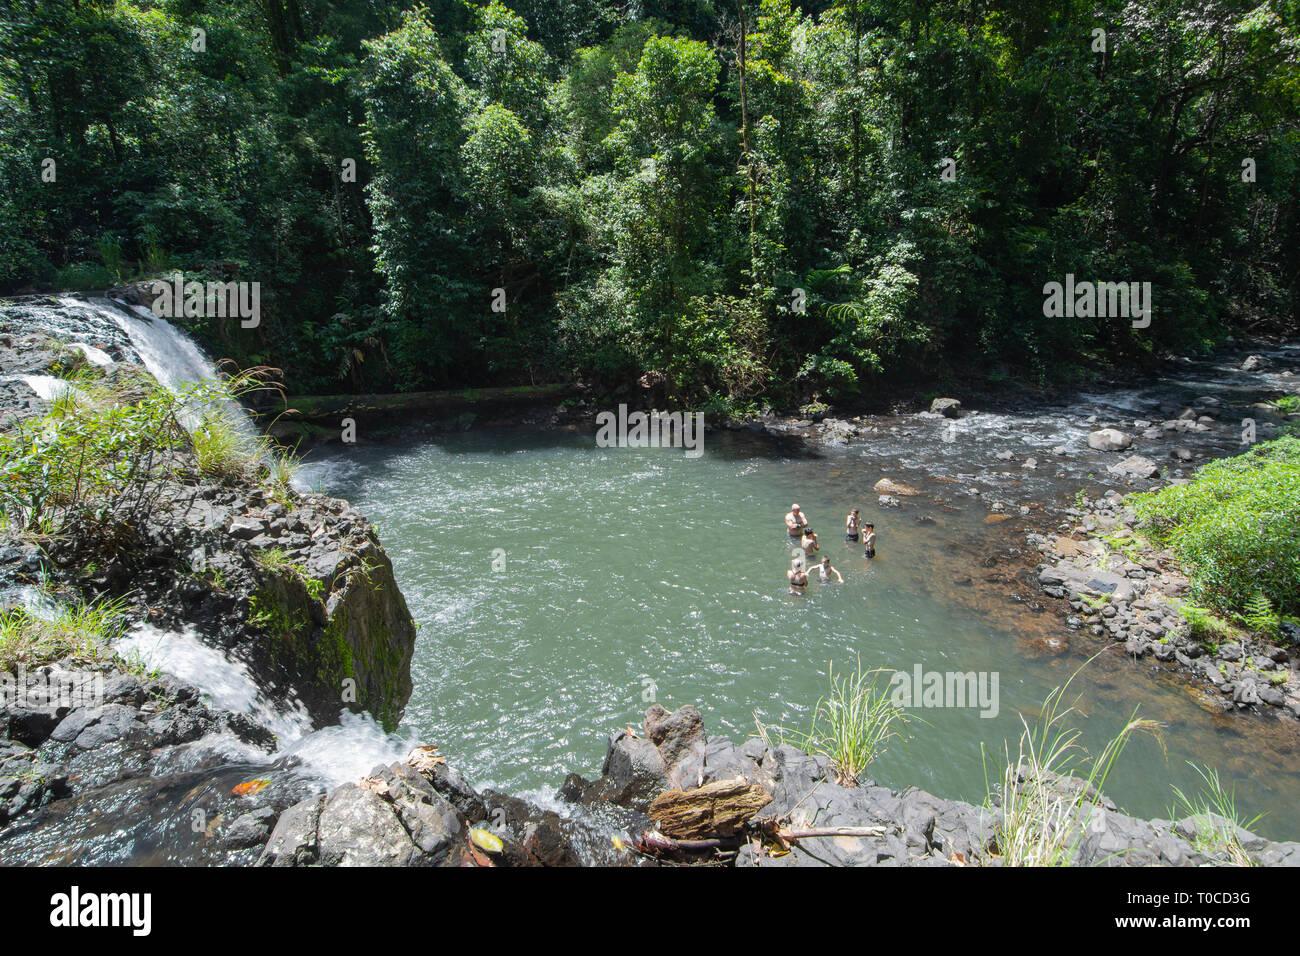 Family swimming at Nandroya Falls in Wooroonooran National Park, Far North Queensland, FNQ, QLD, Australia Stock Photo